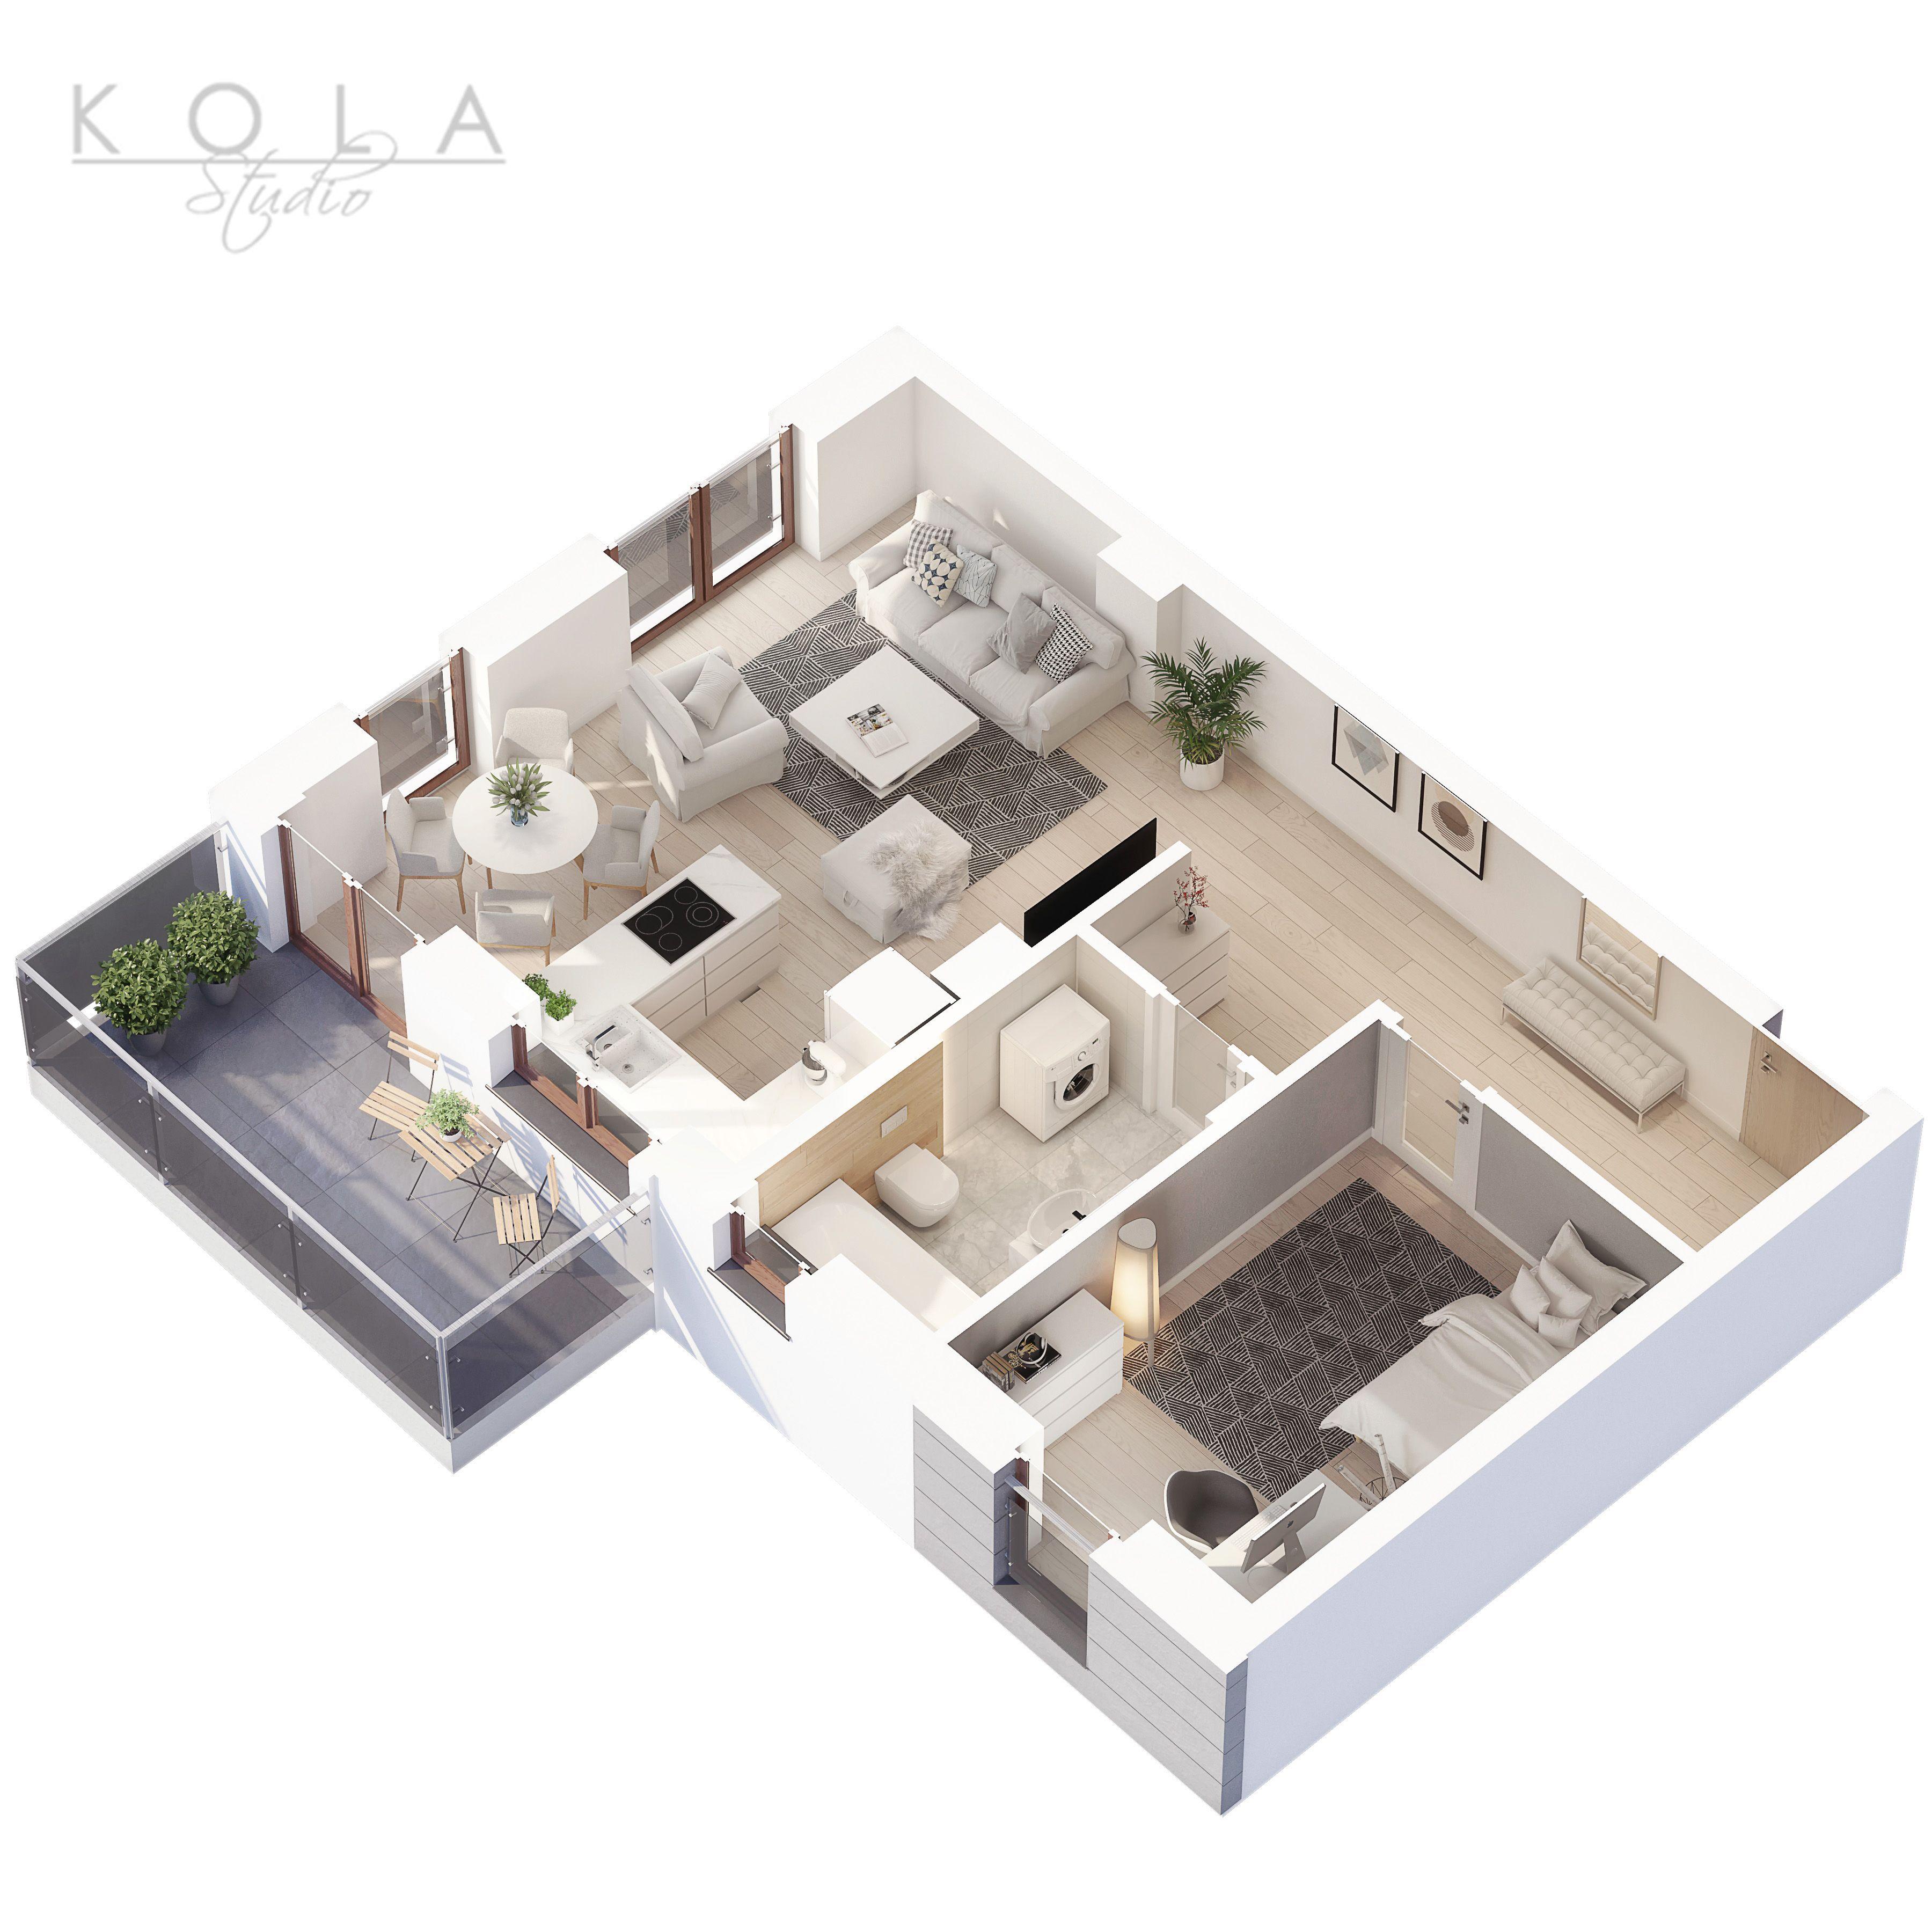 New 2 Bedroom Apartment With Balcony 3d Floor Layout Newhome Newapartment Houseplan 3dplan Layflatphoto Topview Denah Rumah Rumah Ide Dekorasi Kamar